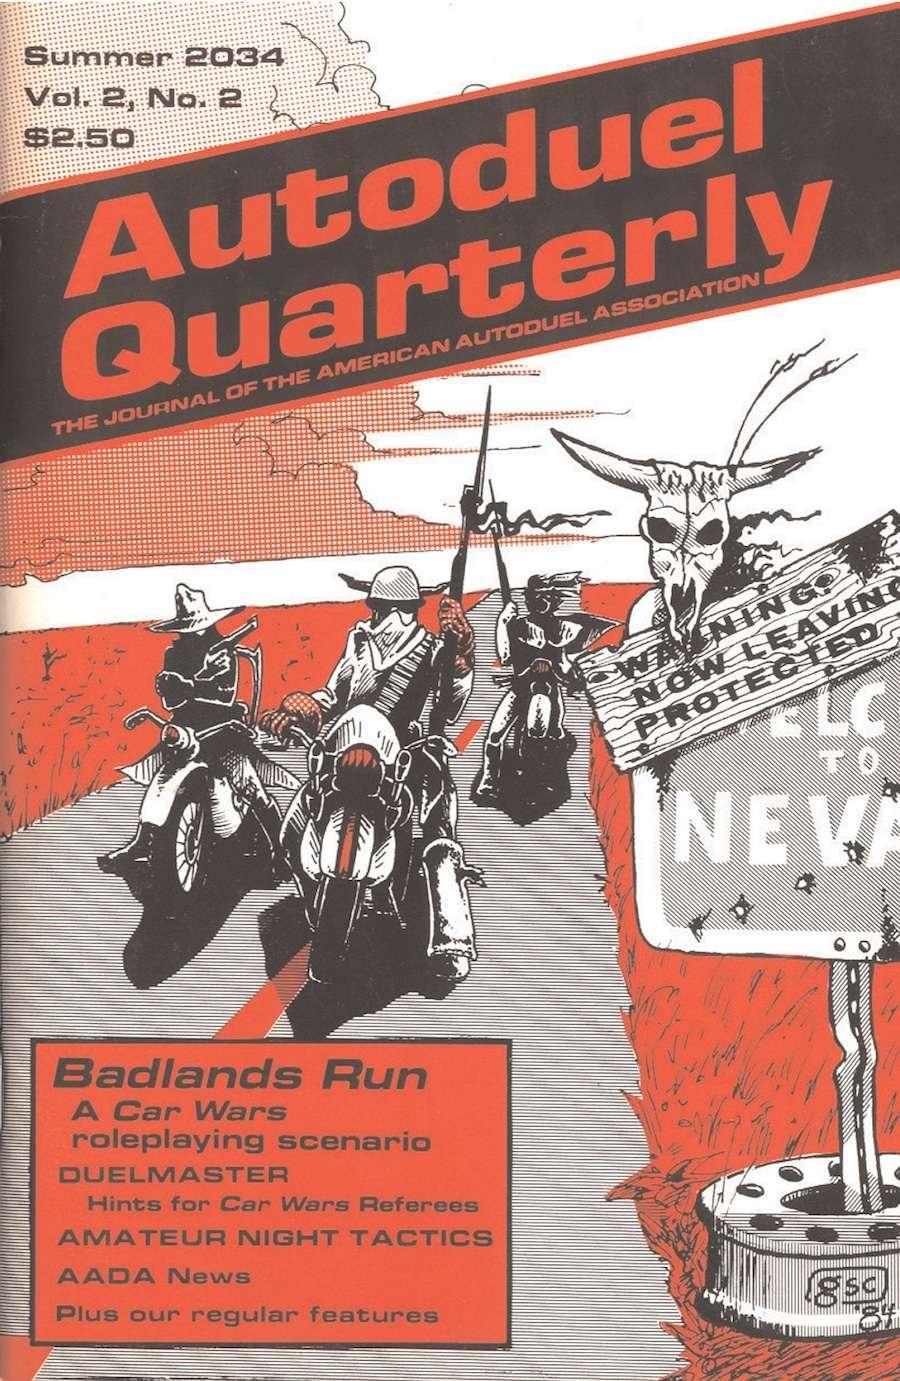 Pdf autoduel quarterly